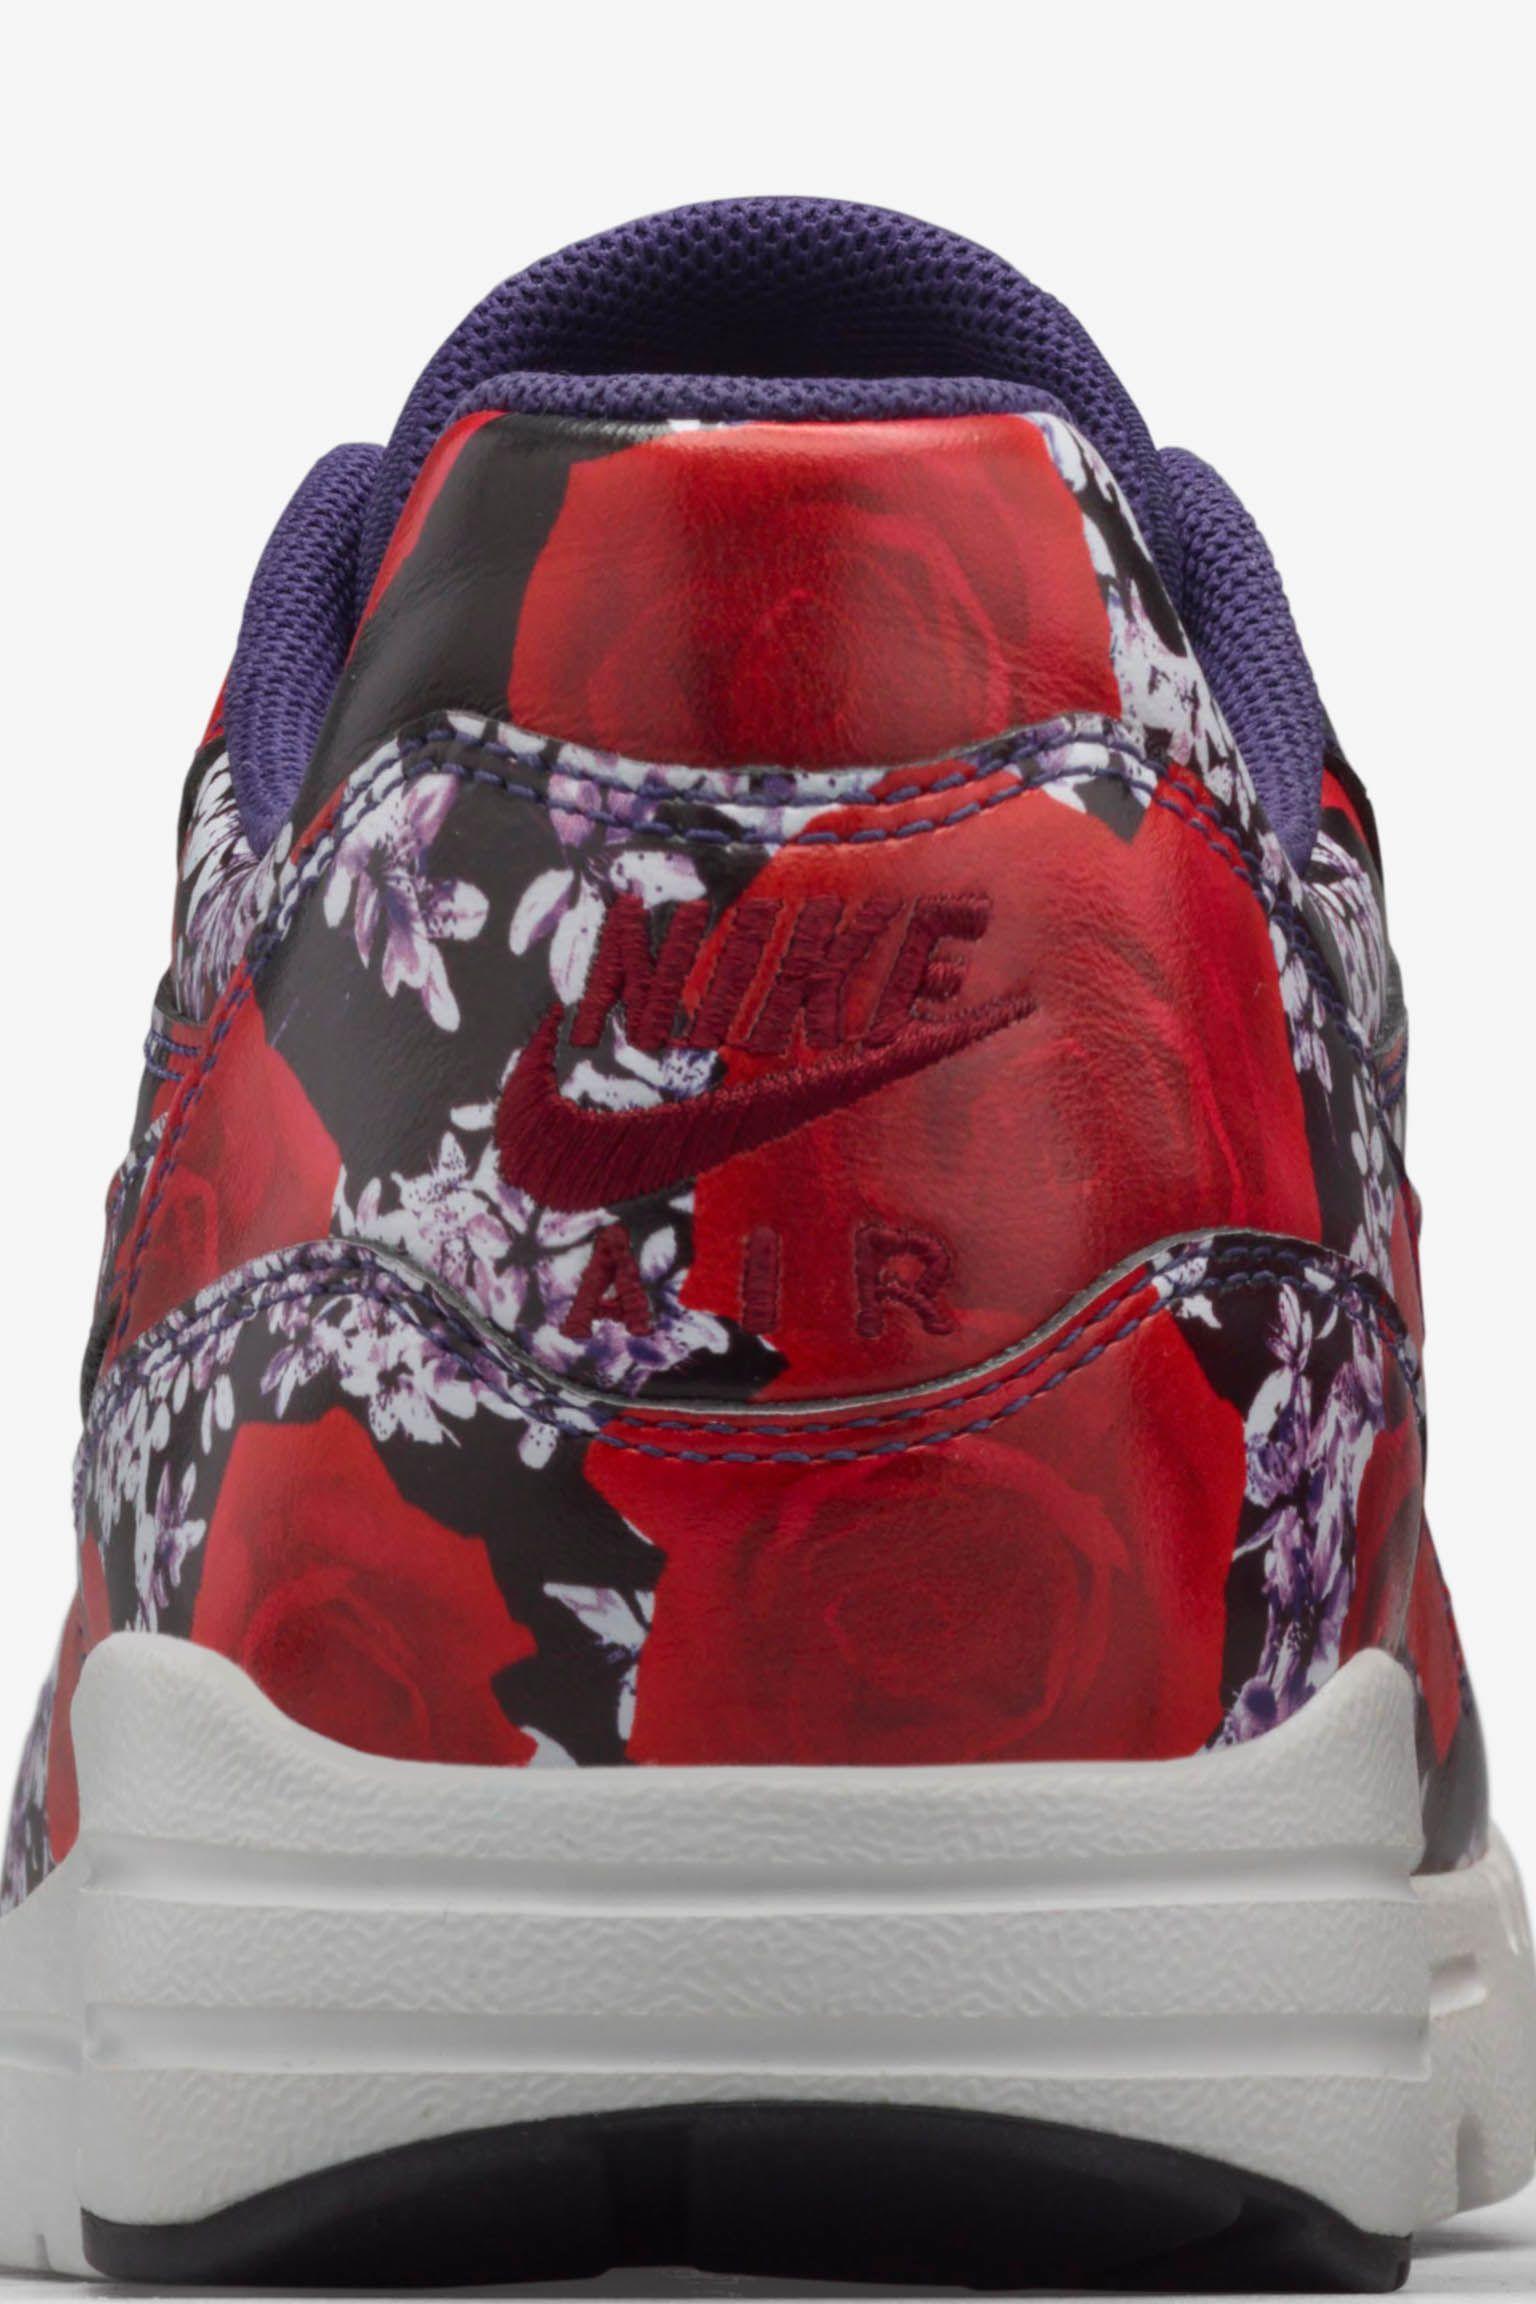 Dámská bota Nike Air Max 1 Ultra Moire 'London'